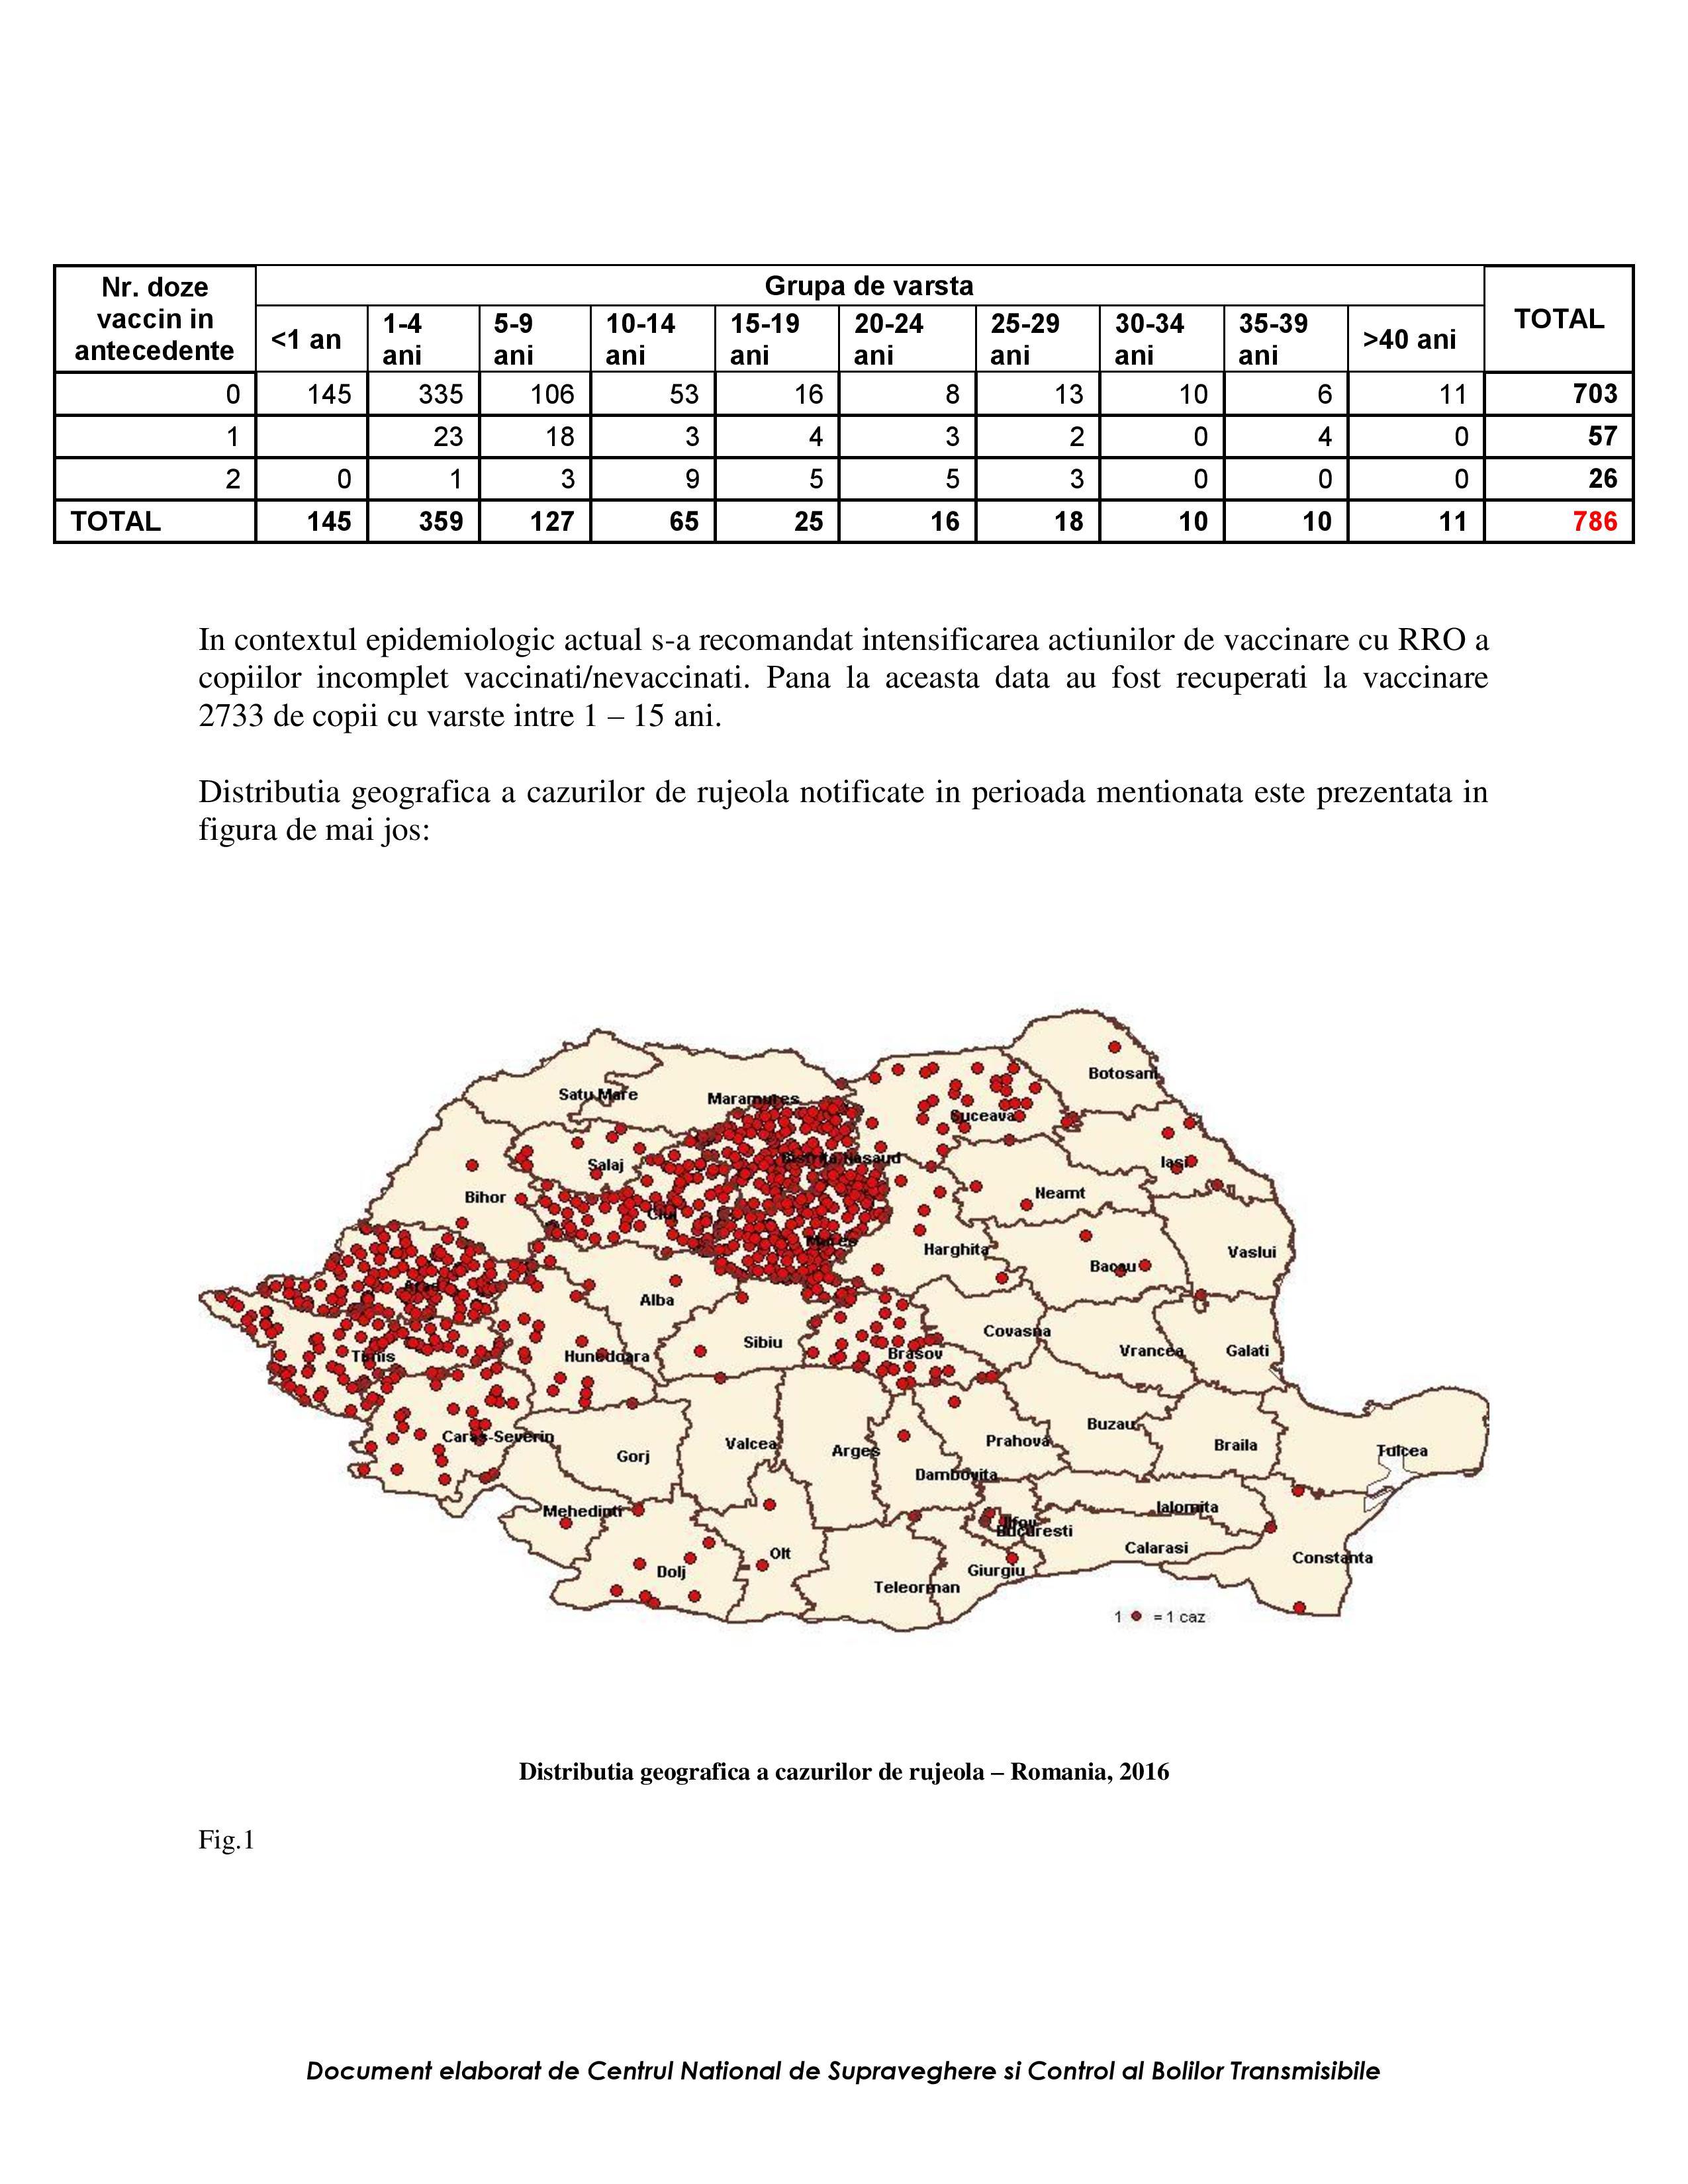 situatia-rujeolei-in-romania-la-data-de-14-10-2016-page-002